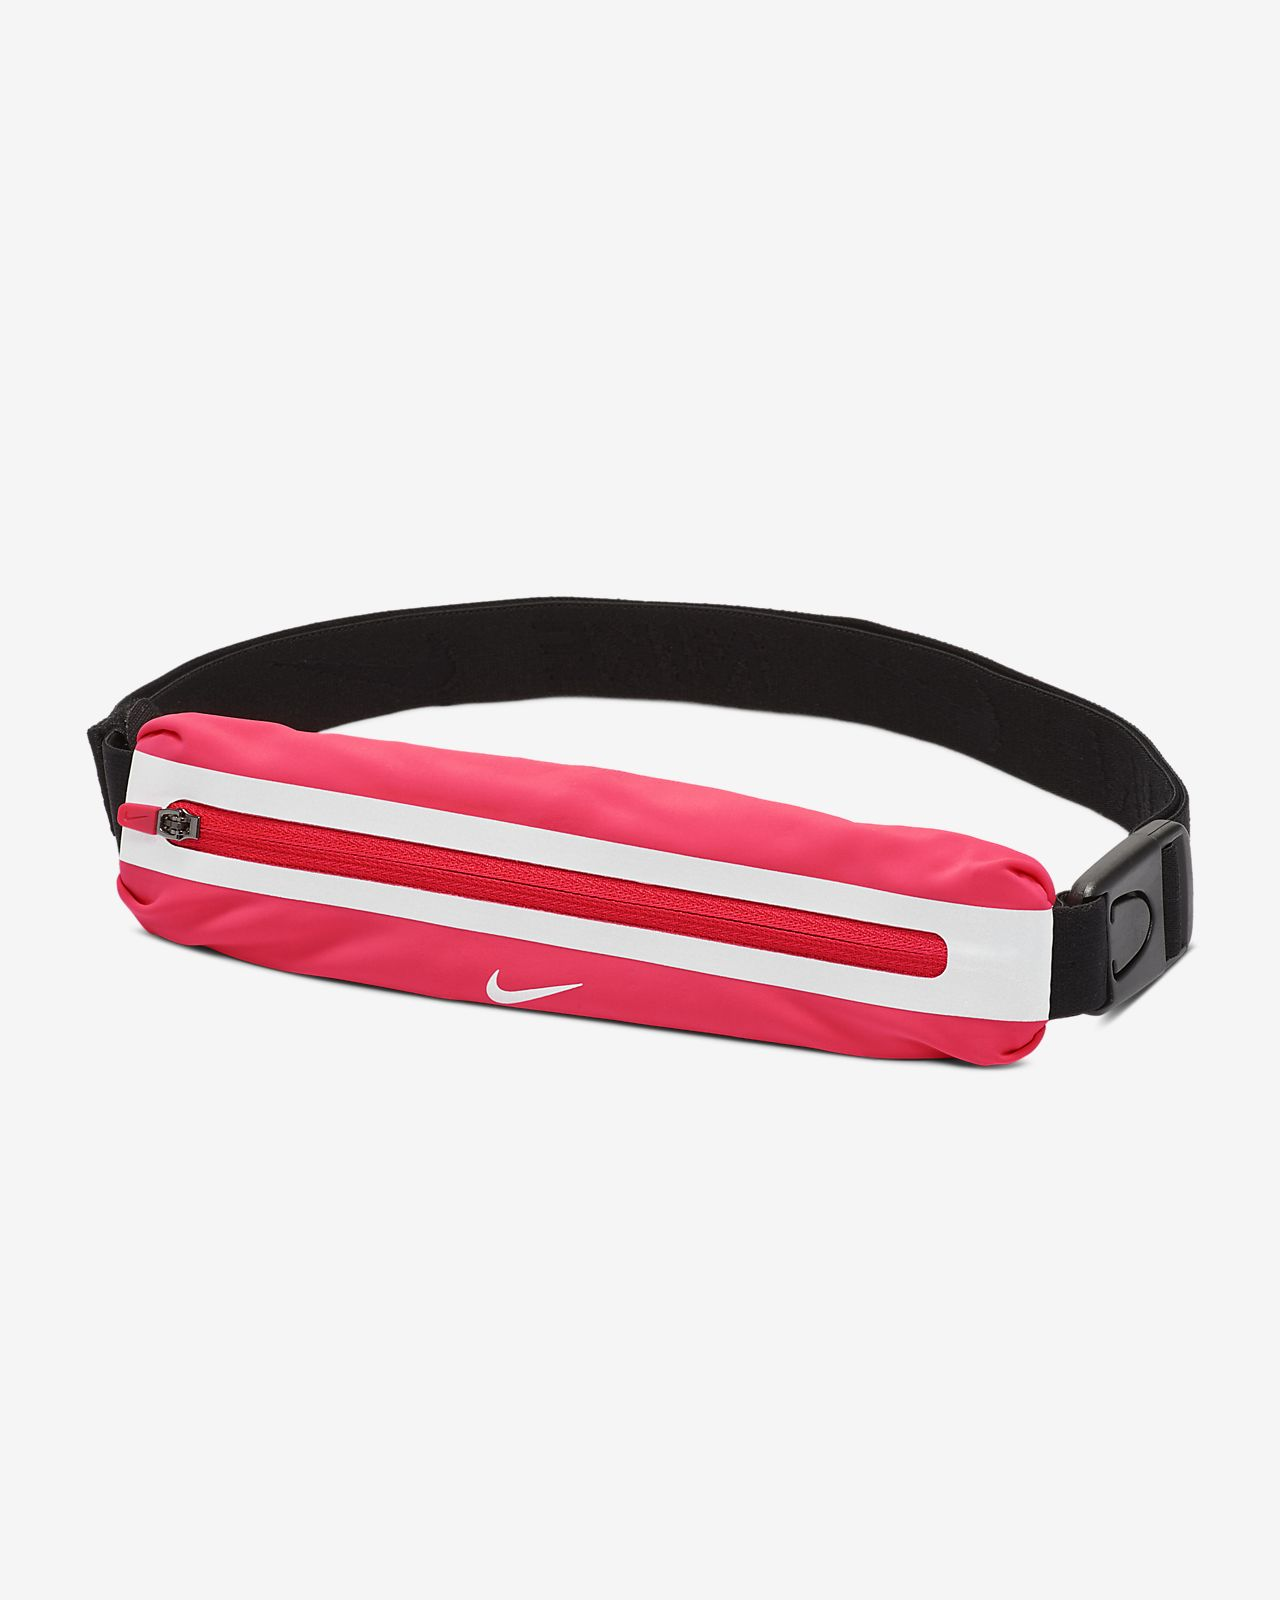 Nike schlanke Gürteltasche 2.0